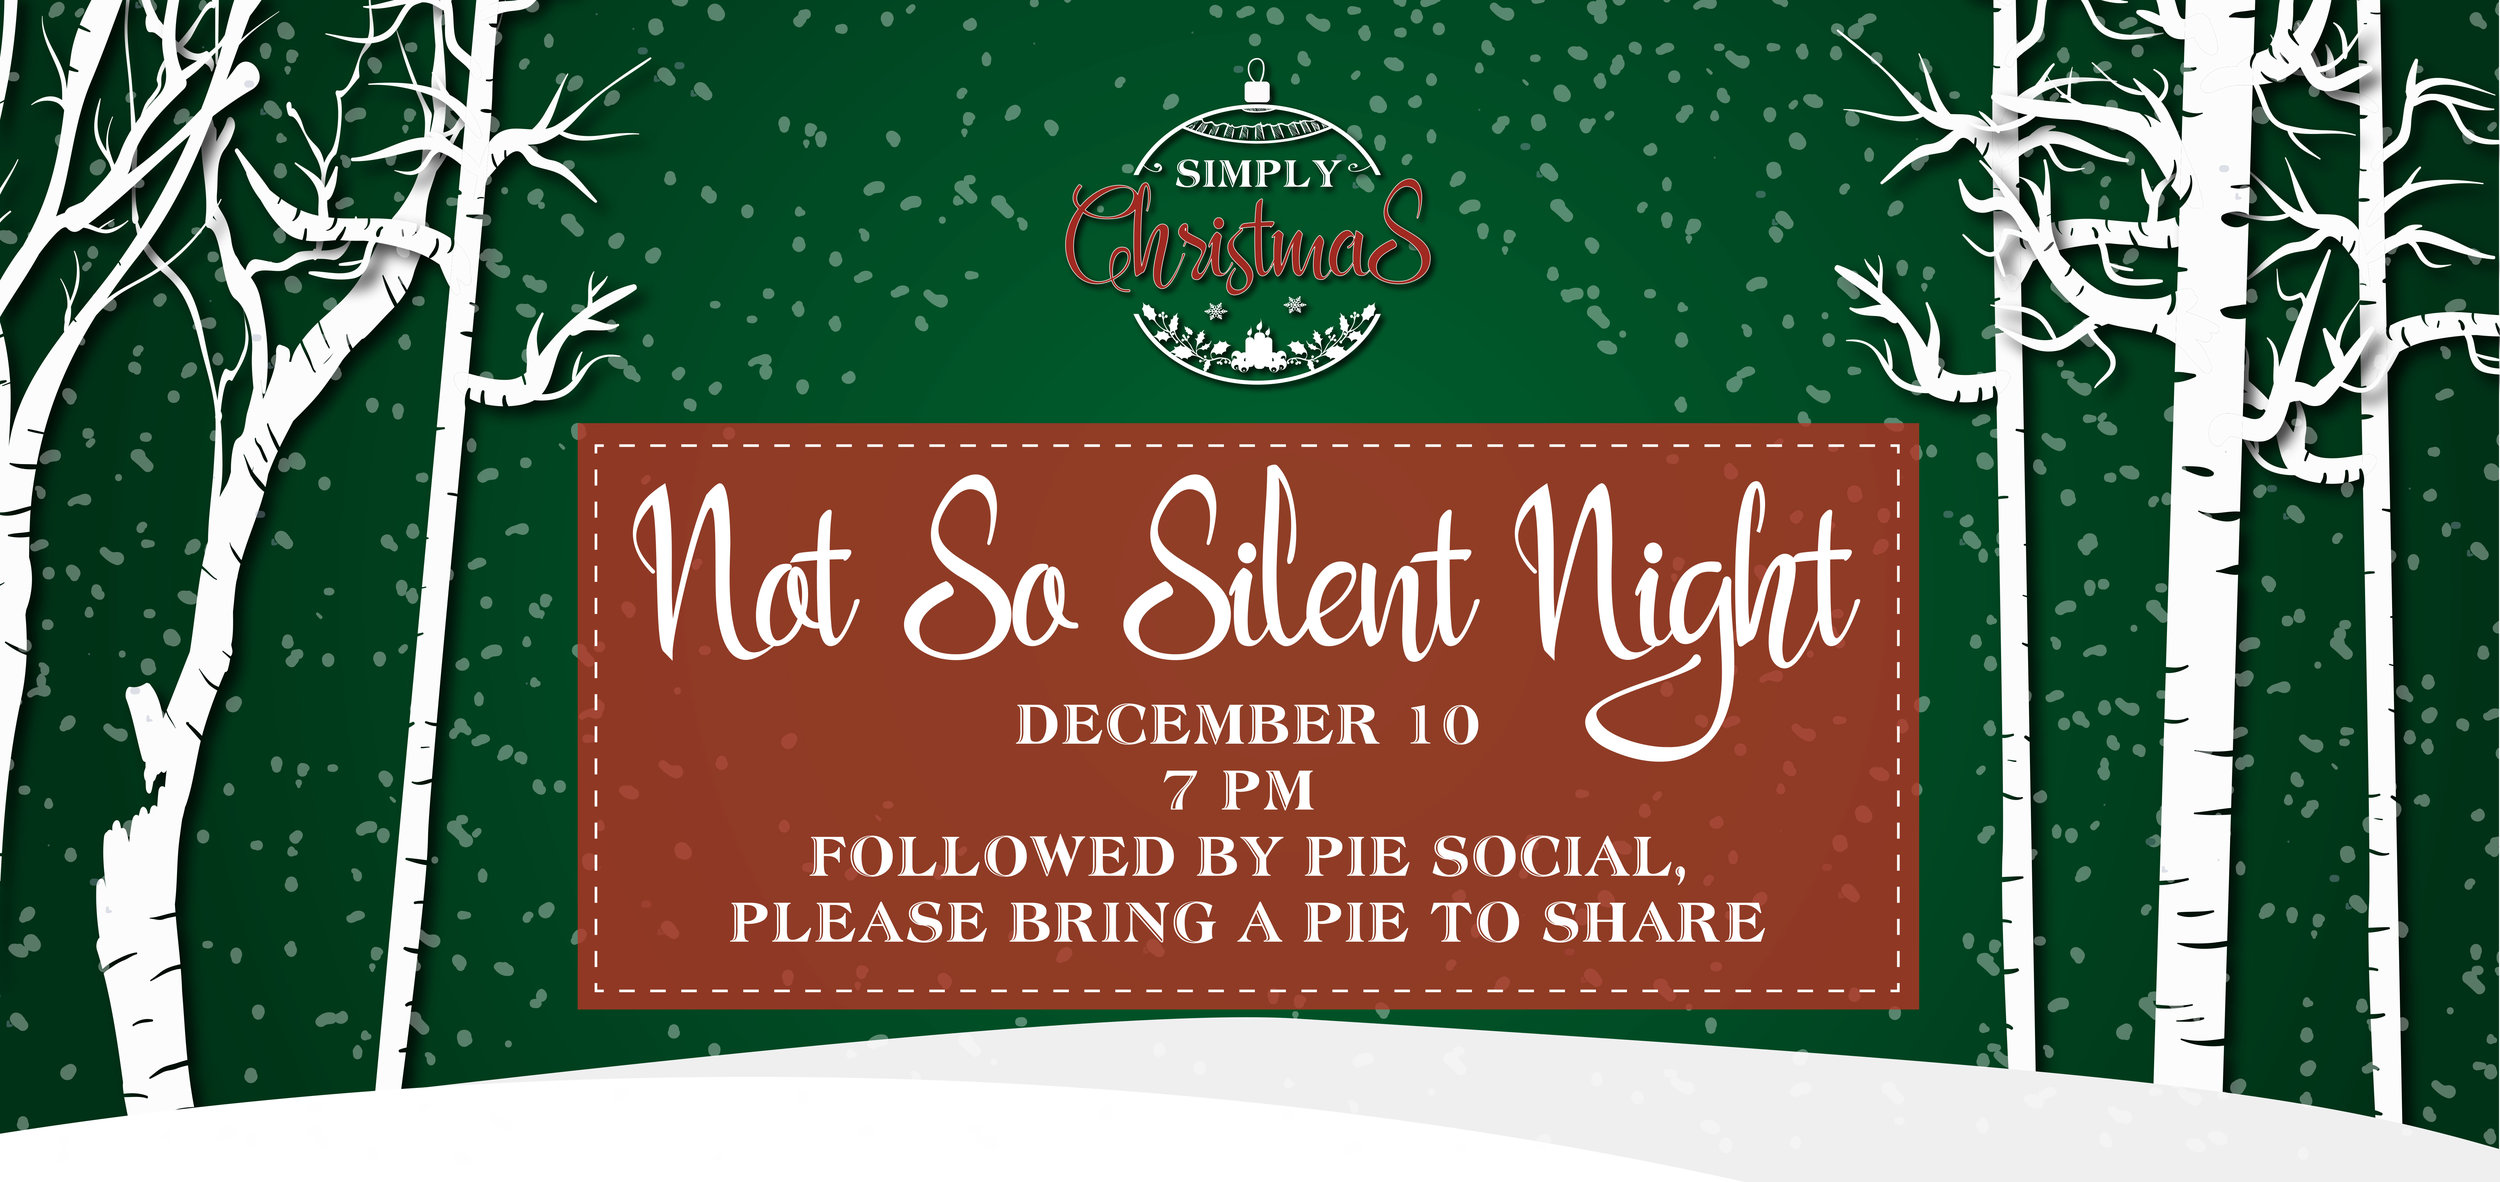 Christmas-17-Not-So-Silent-Night.jpg